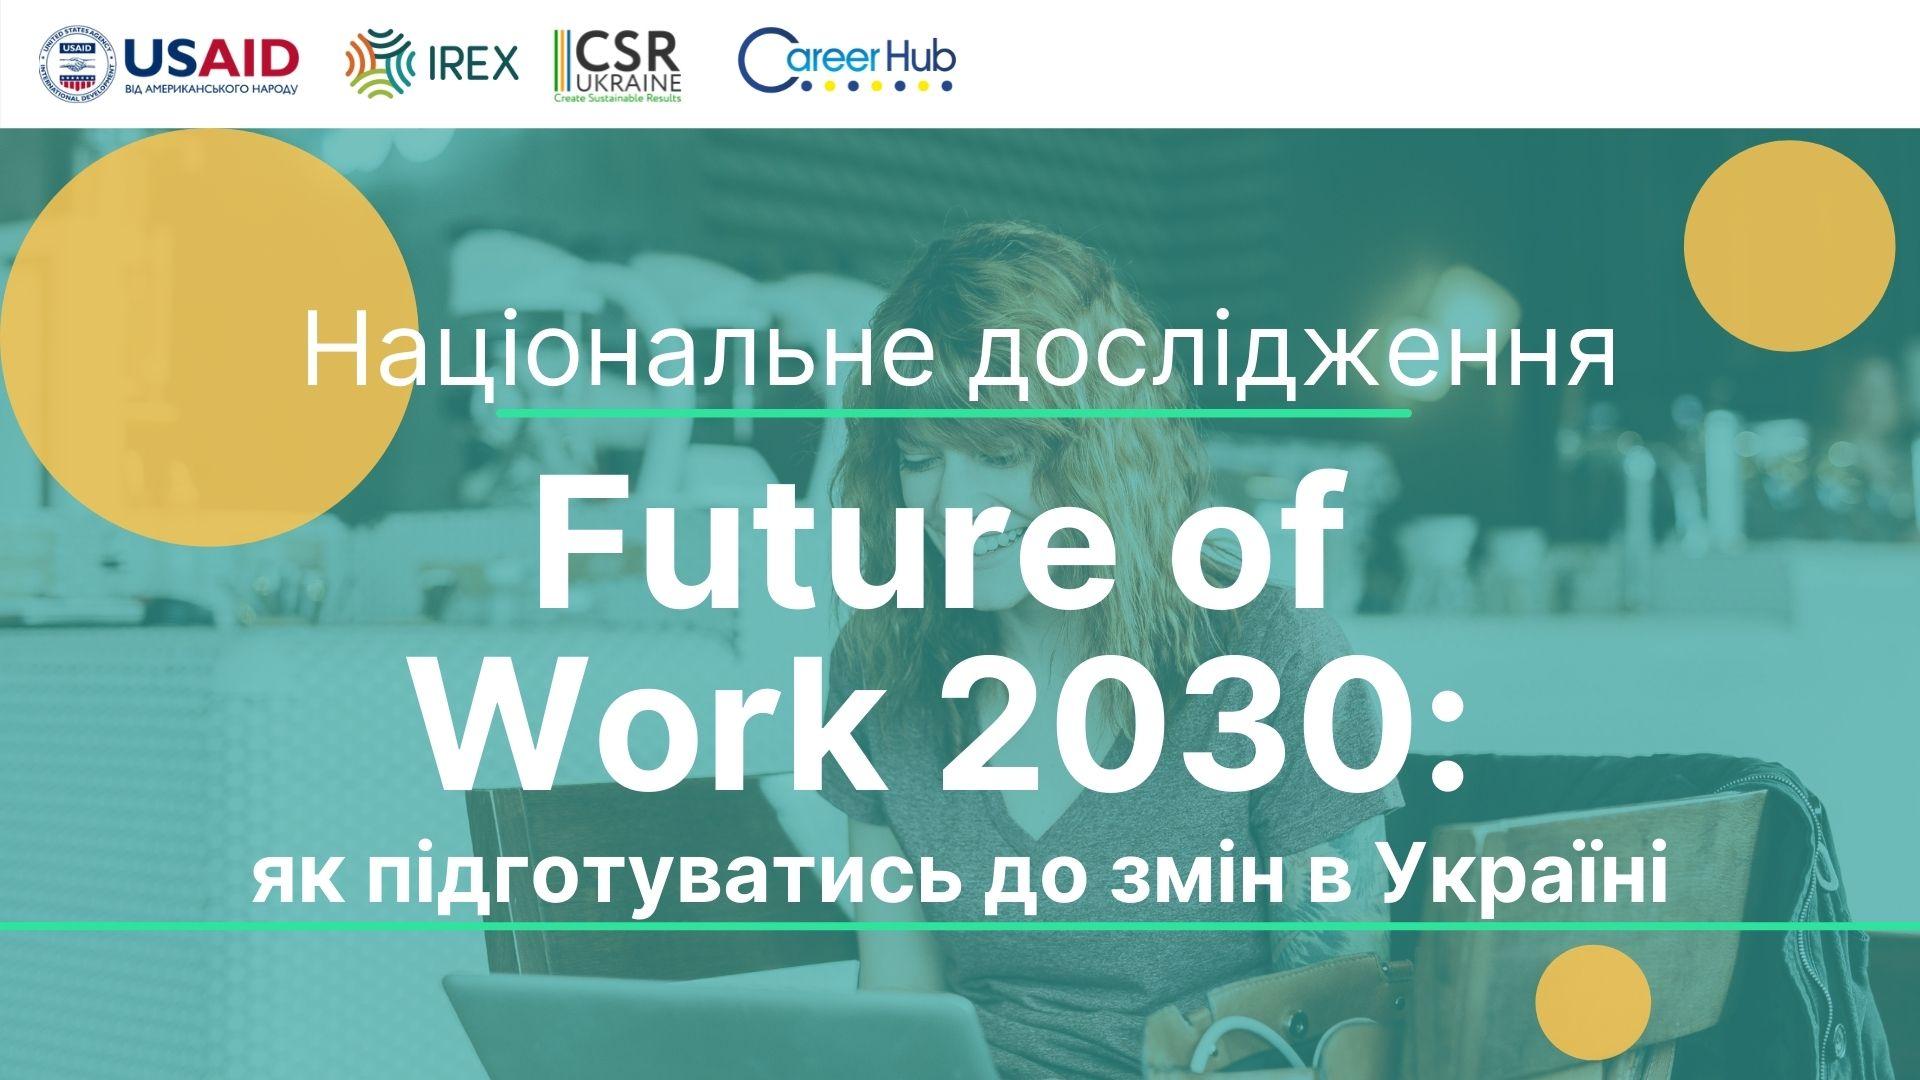 Future of Work 2030